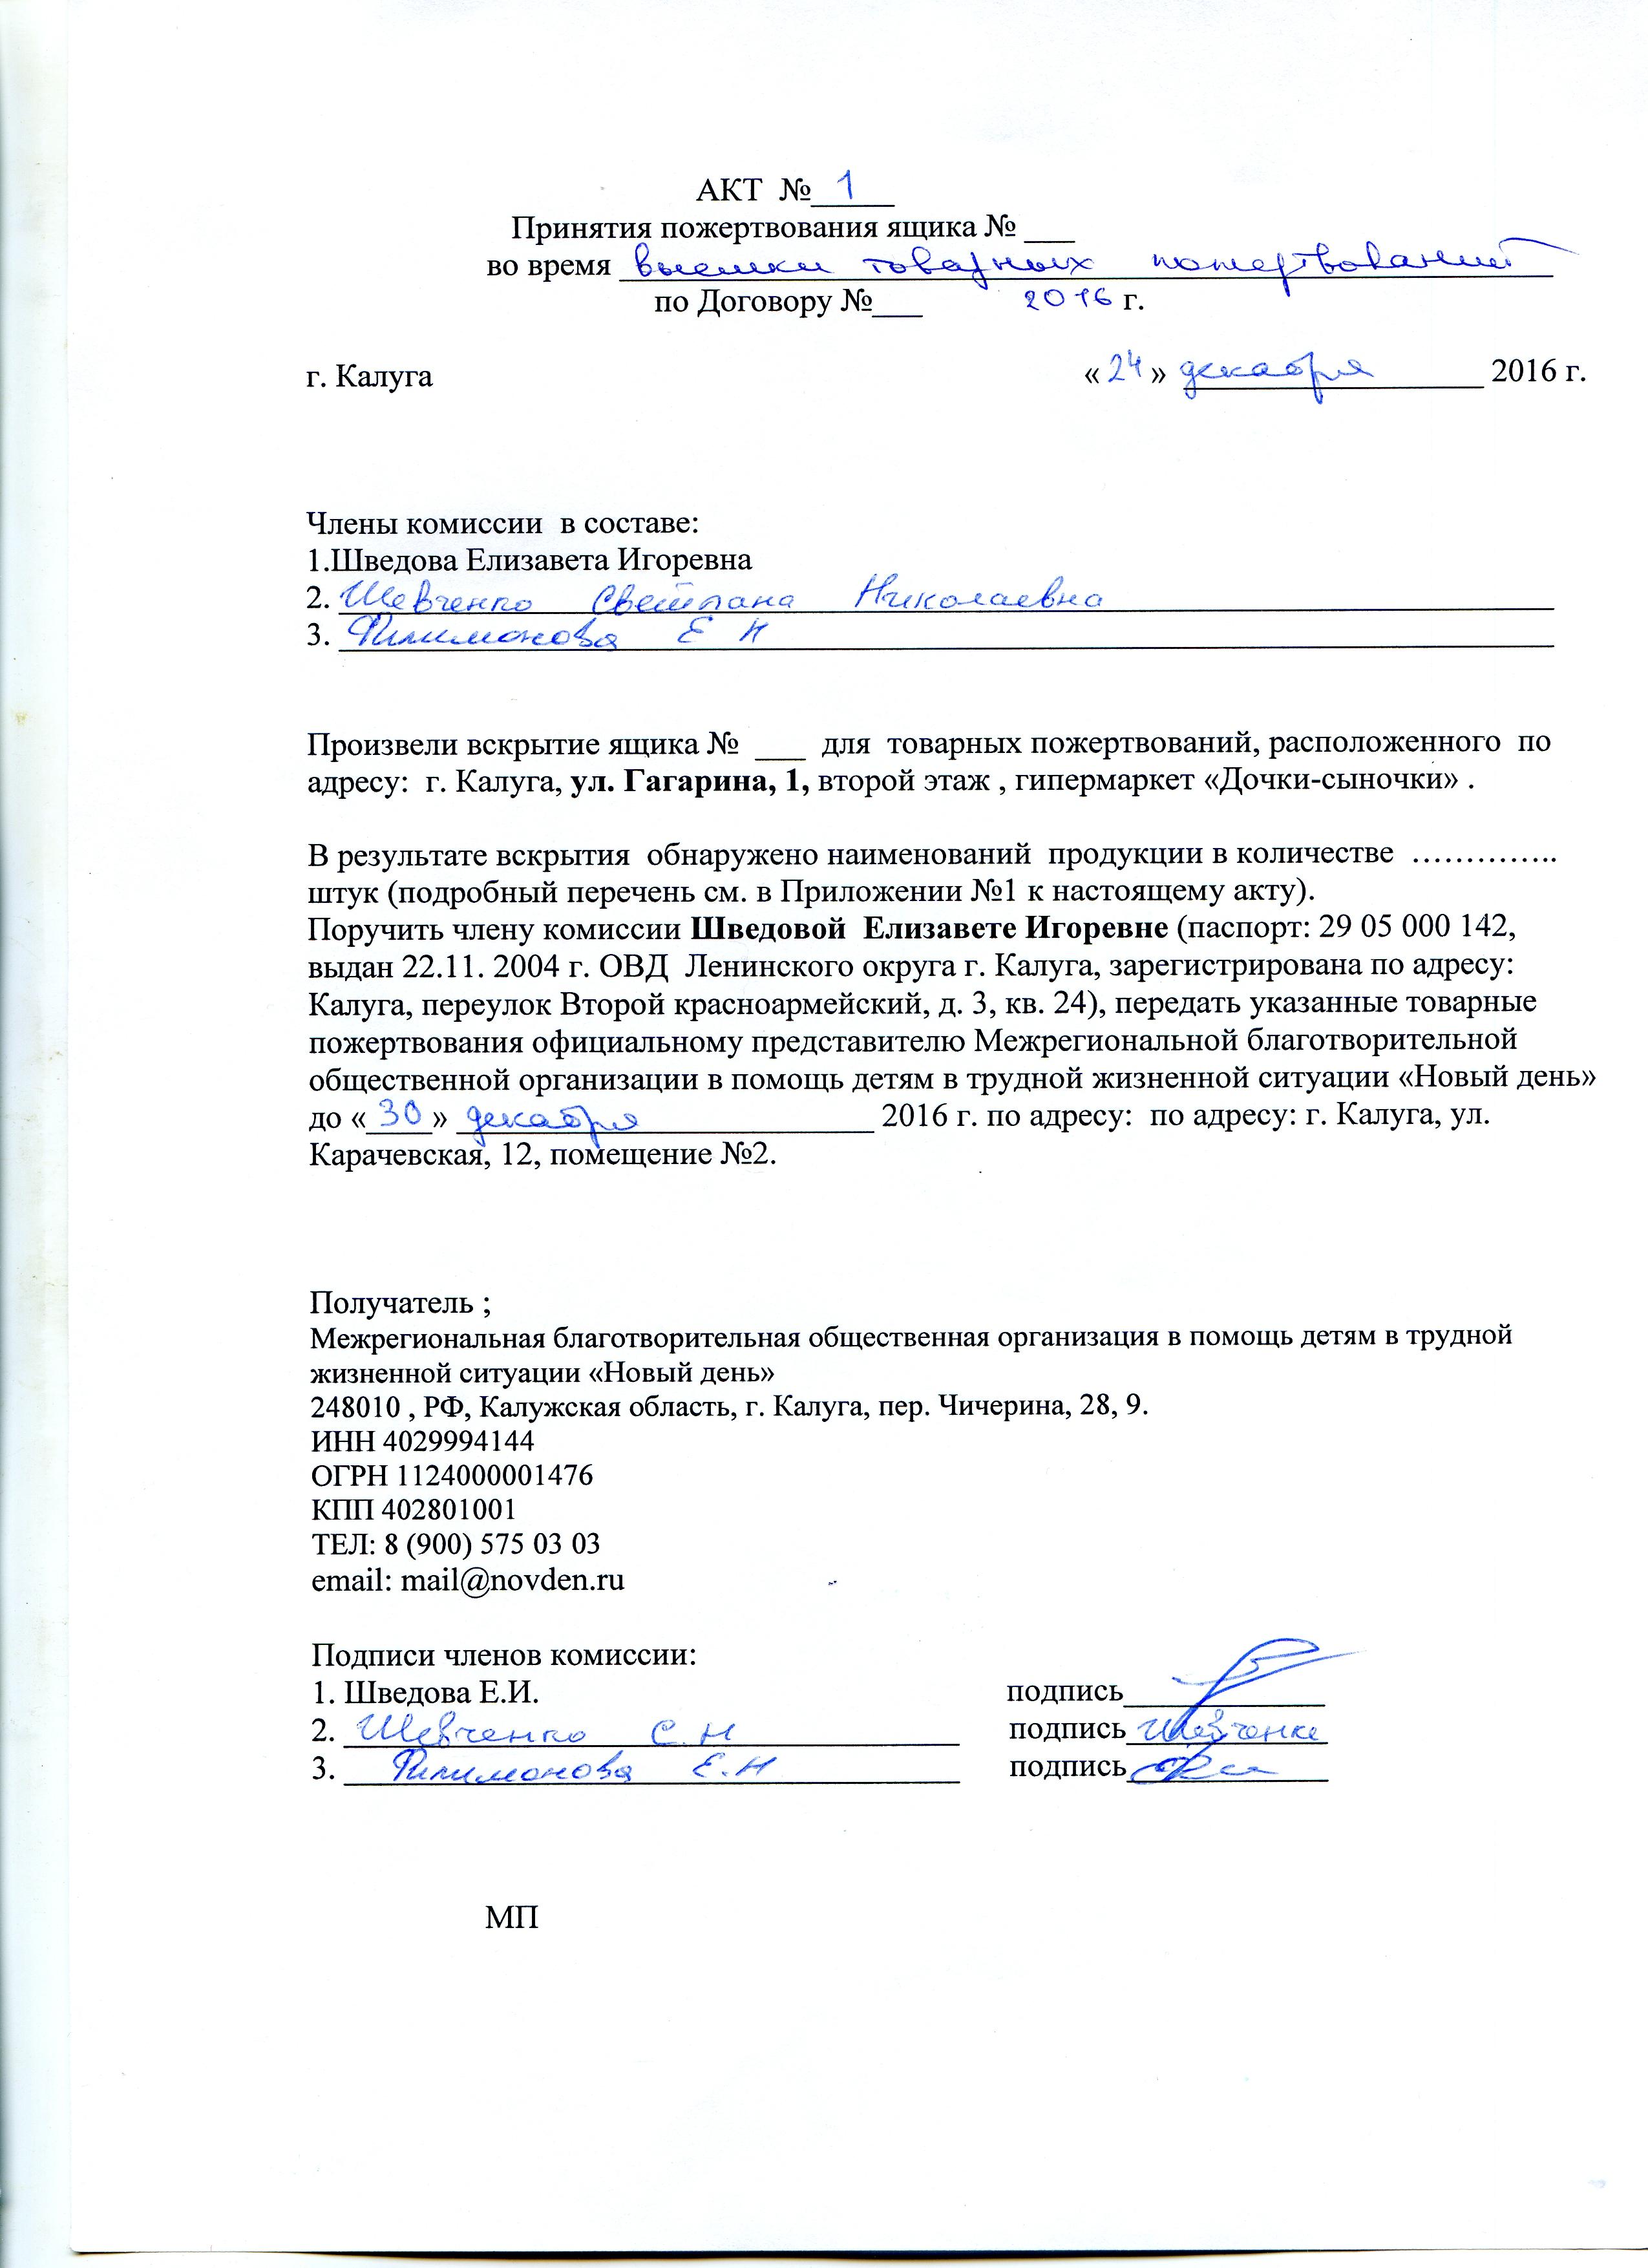 Акт 1 Гагарина 24 декабря 2016294